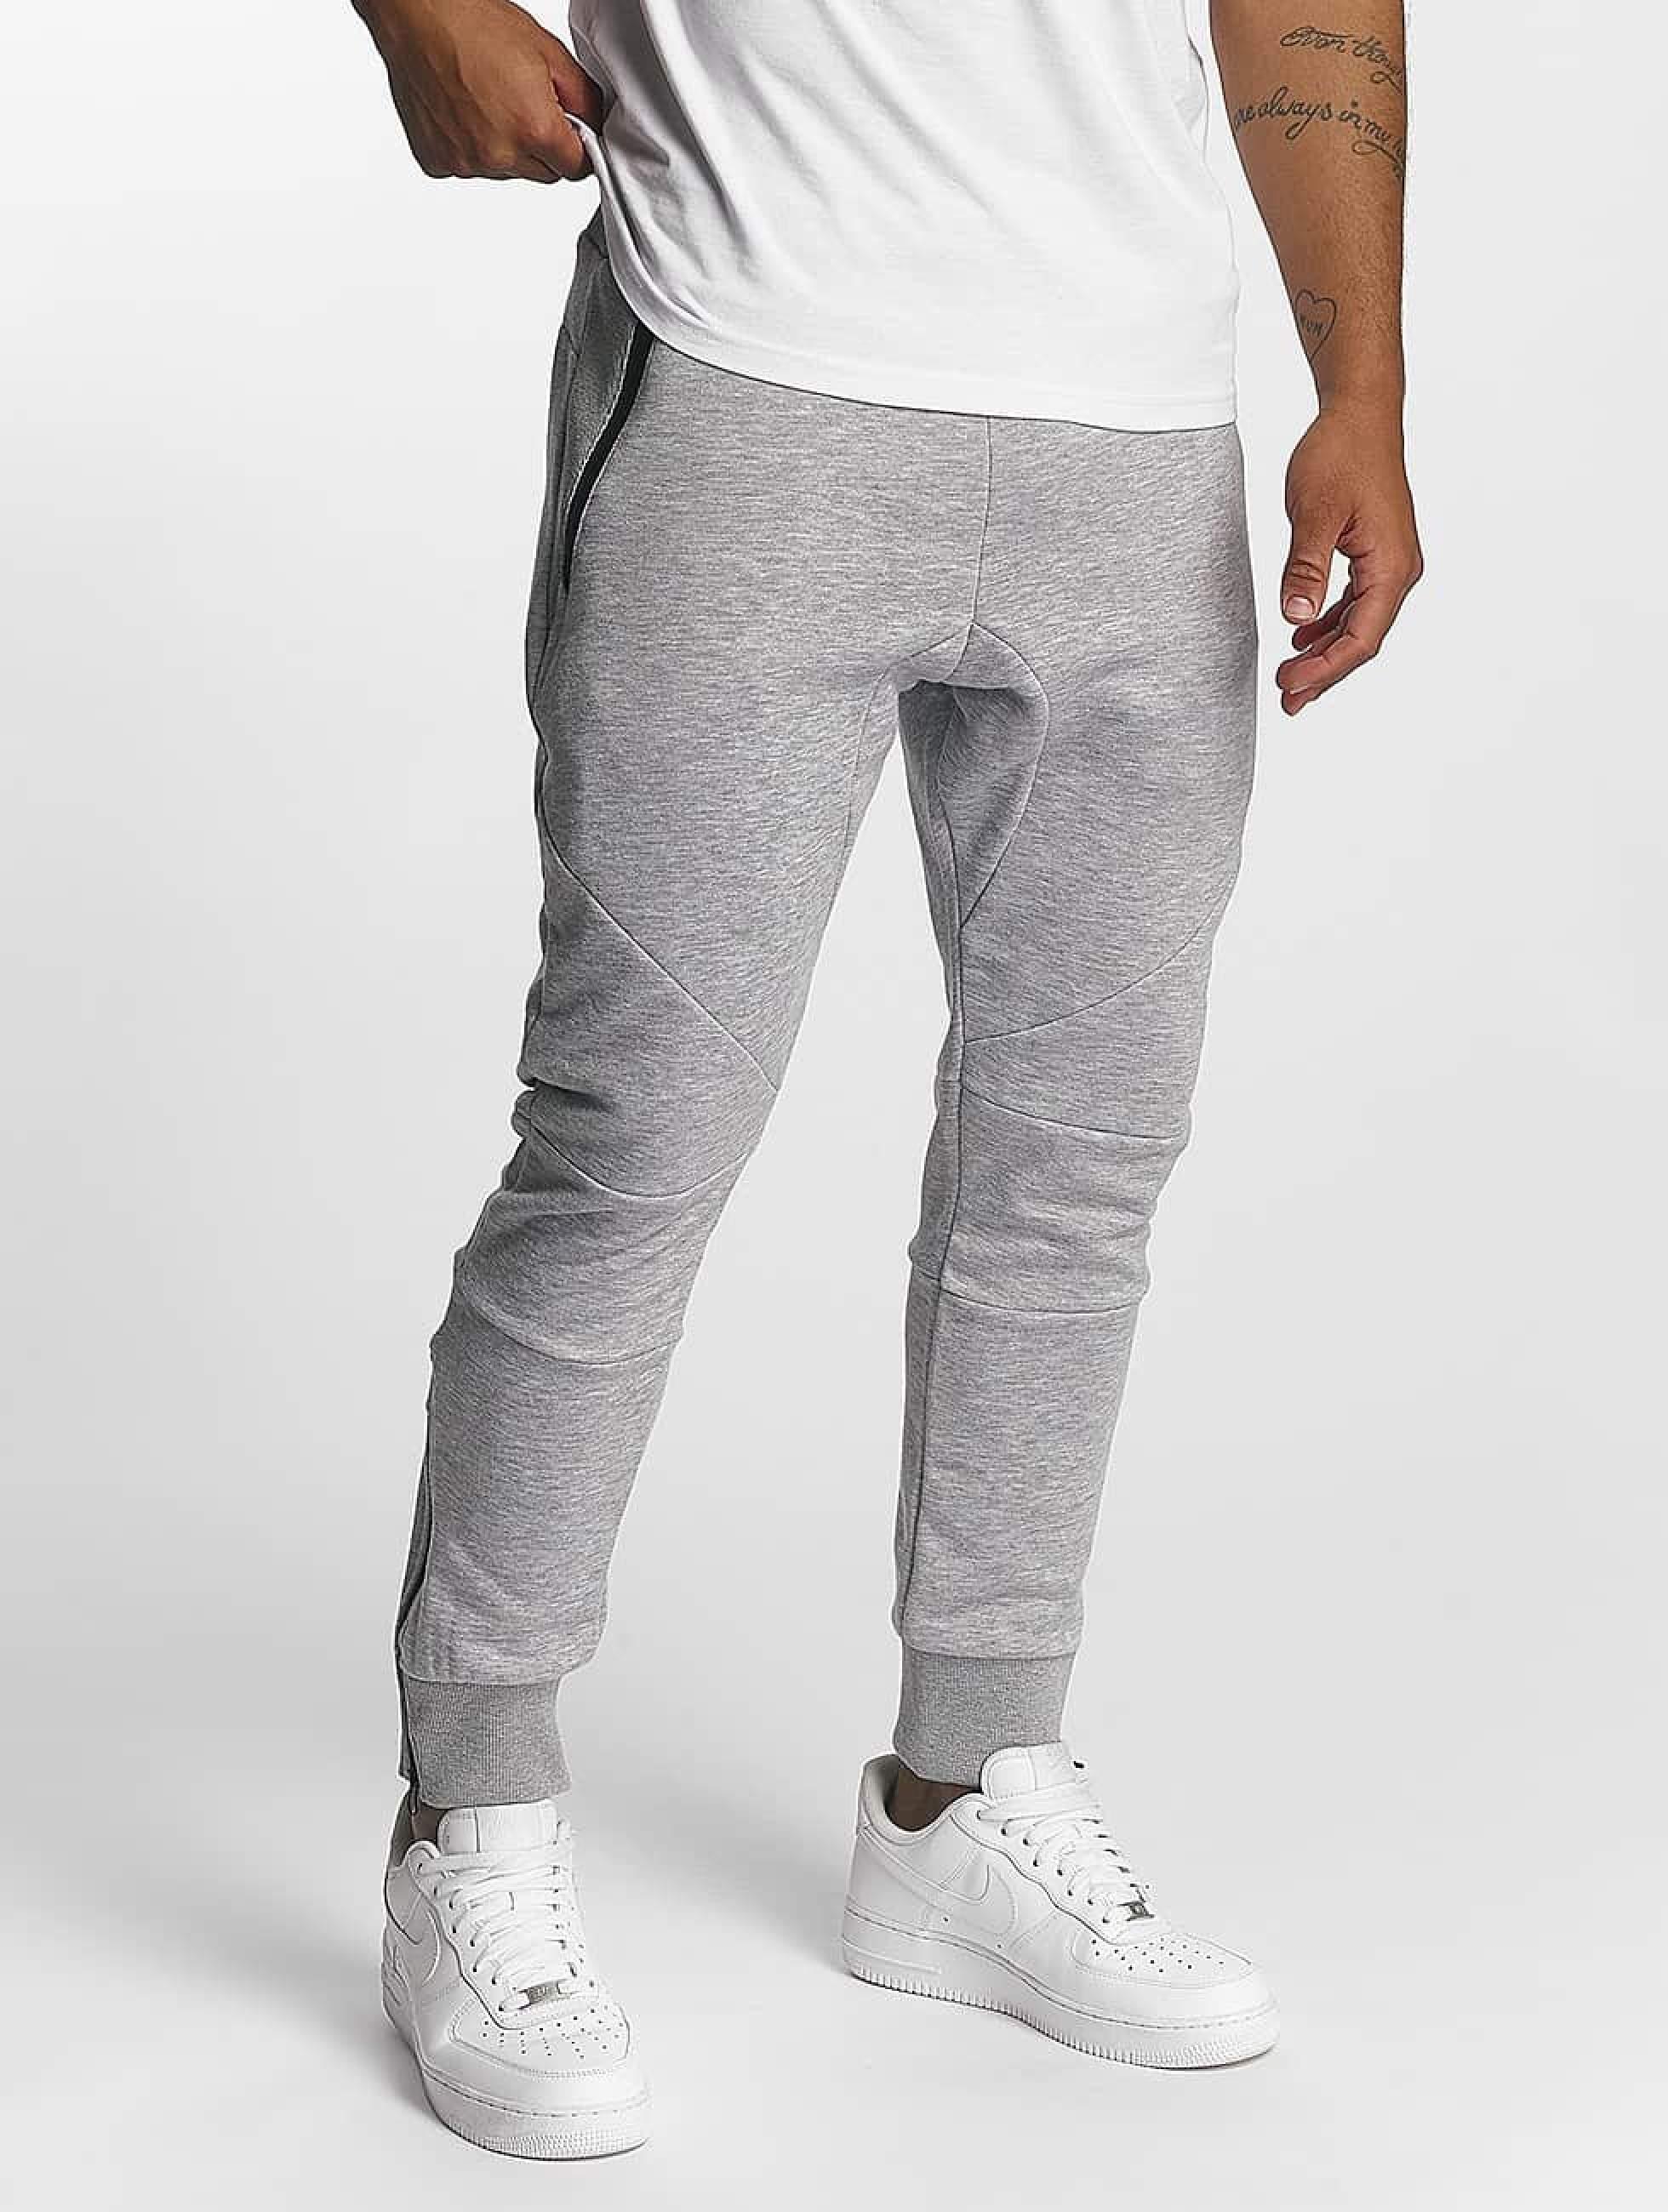 DEF / Sweat Pant Cross in grey 2XL